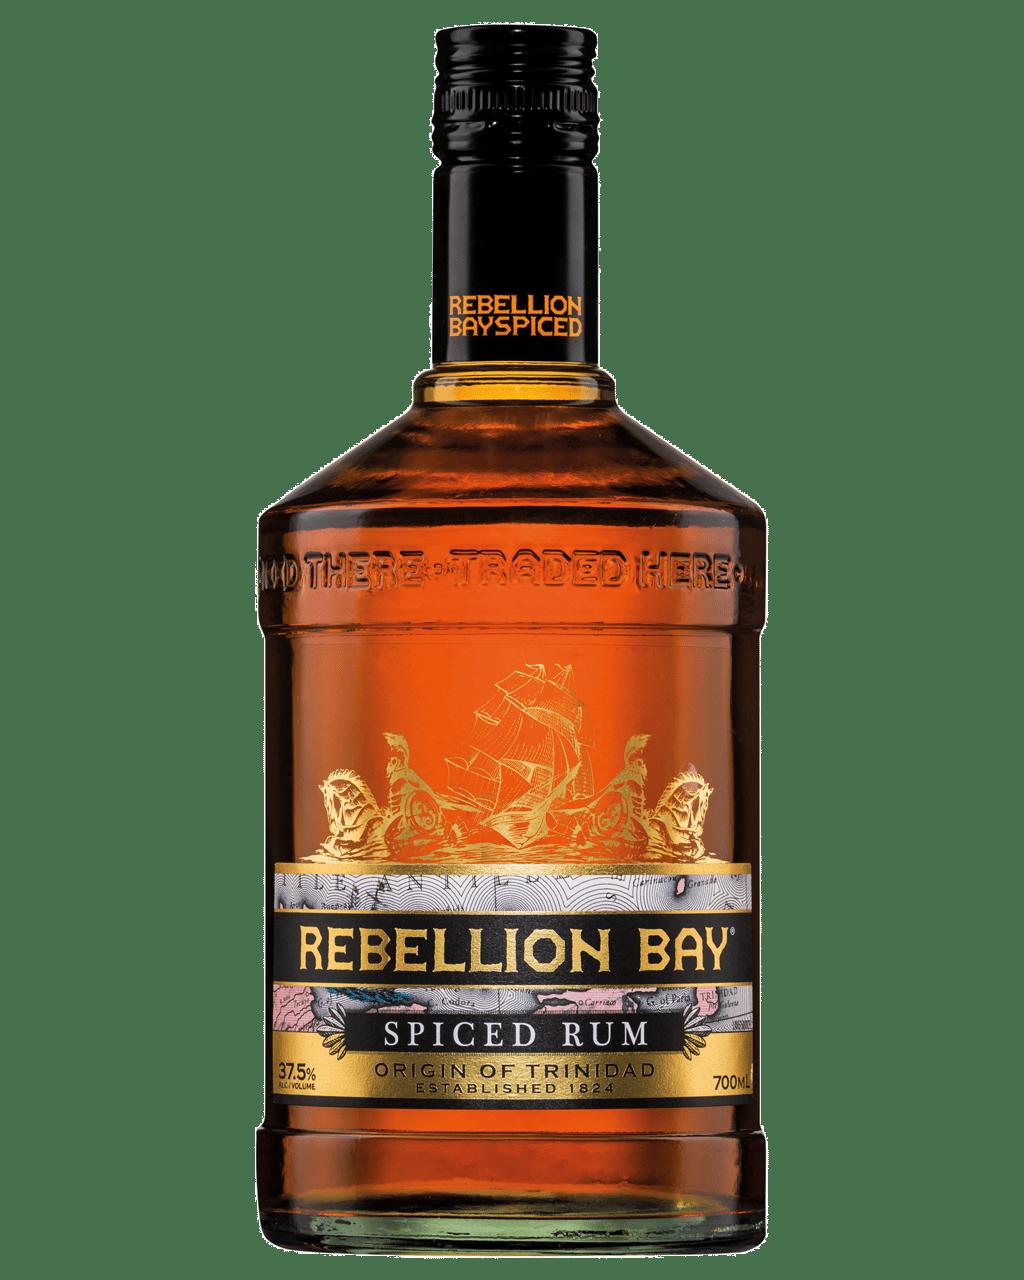 rebellion bay spiced rum 700ml dan murphy s buy wine champagne